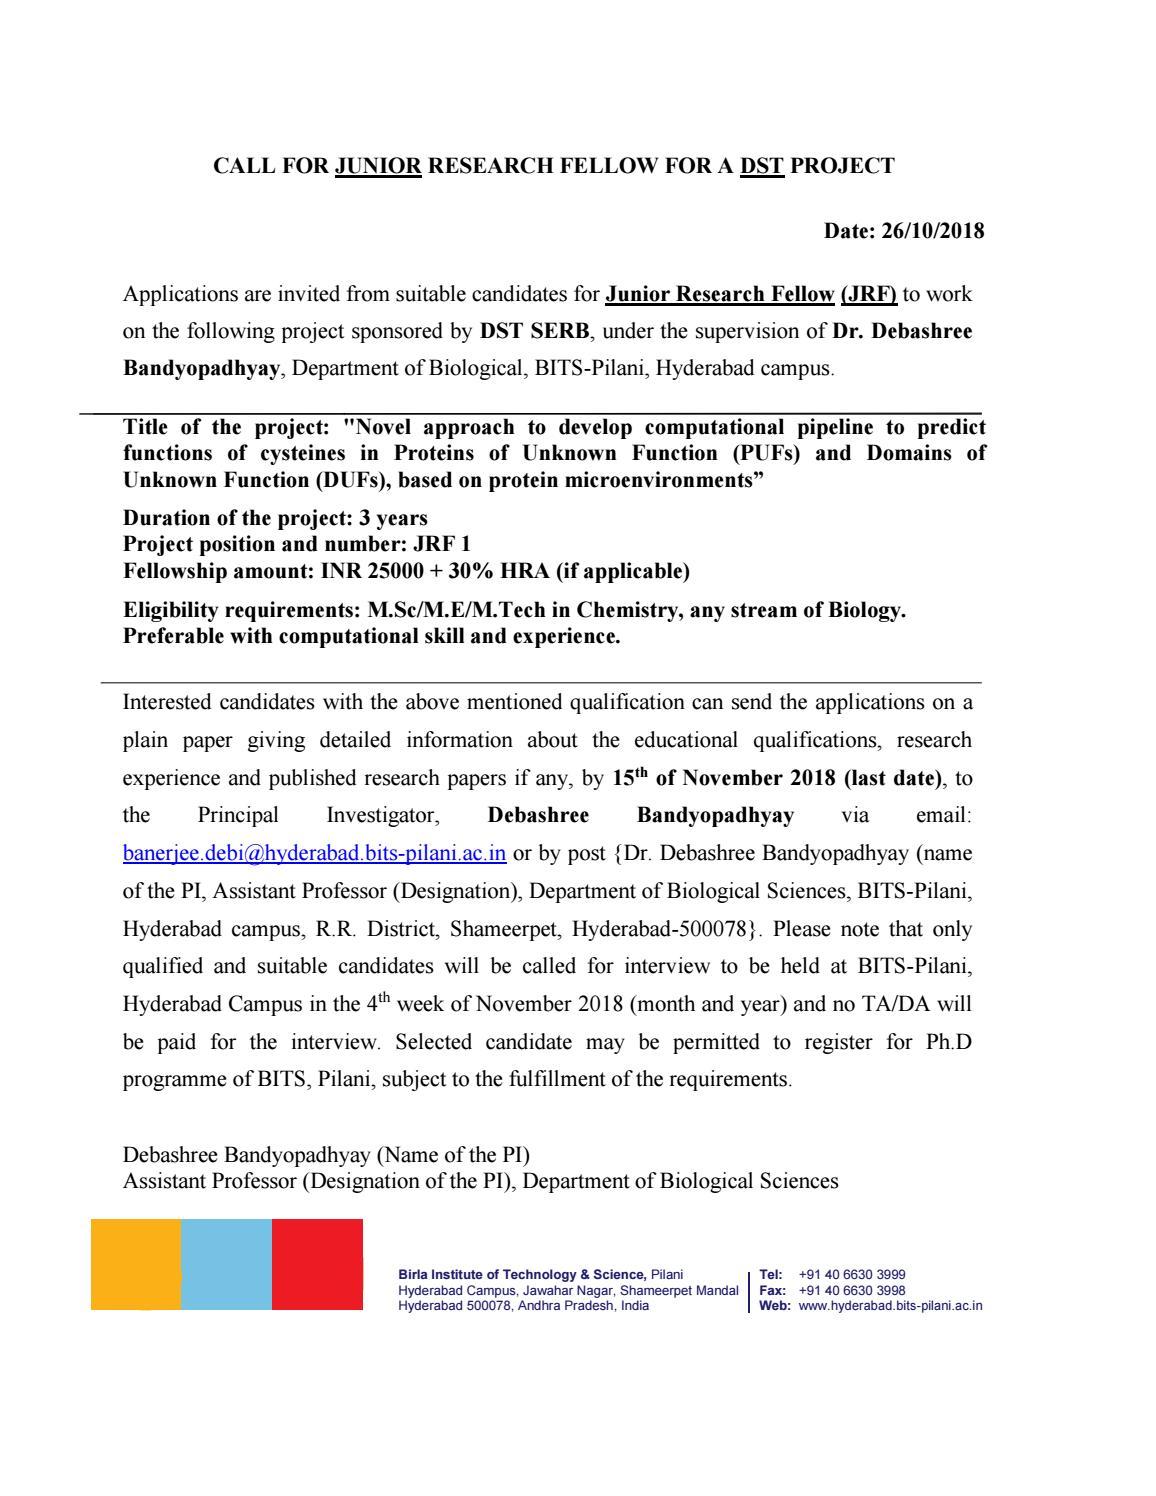 BITS PILANI Recruiting Msc /M Tech chemistry Junior Research Fellow